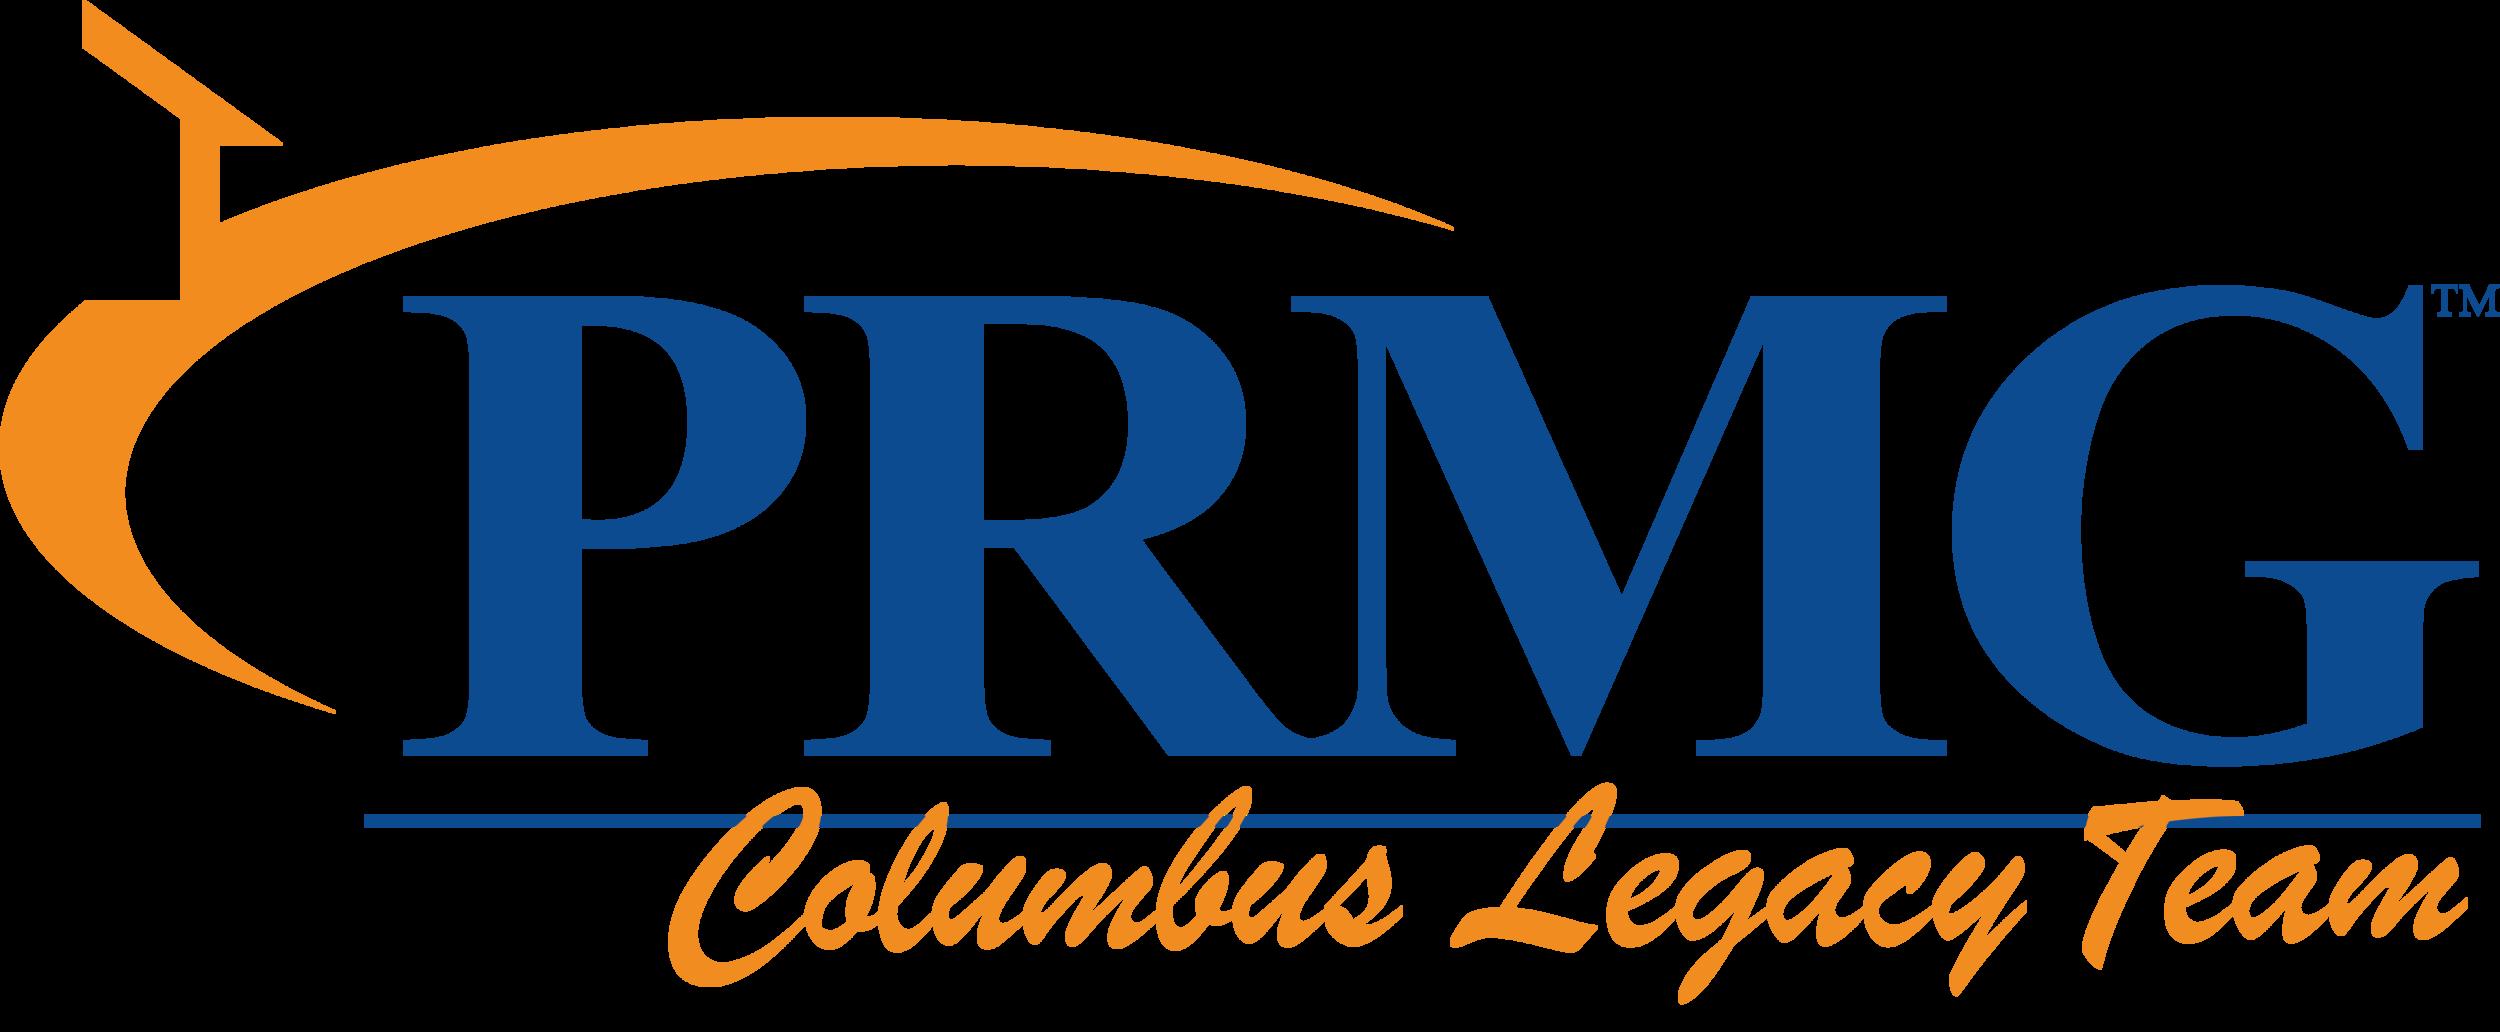 Columbus Legacy Team.png